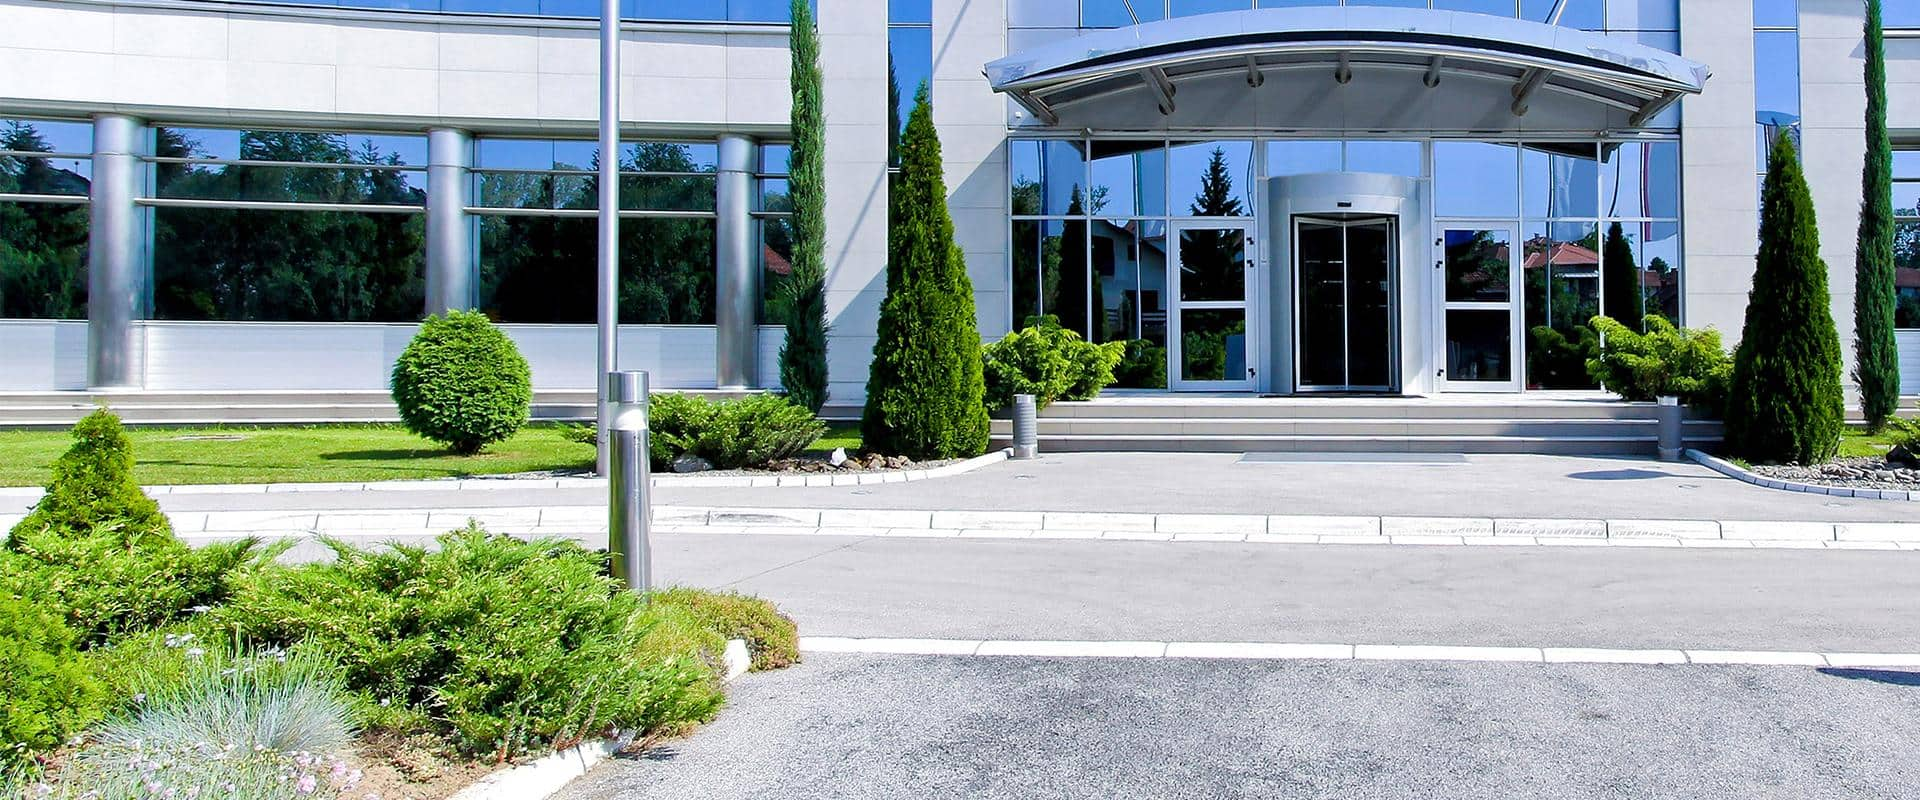 exterior of a commercial building in portland oregon